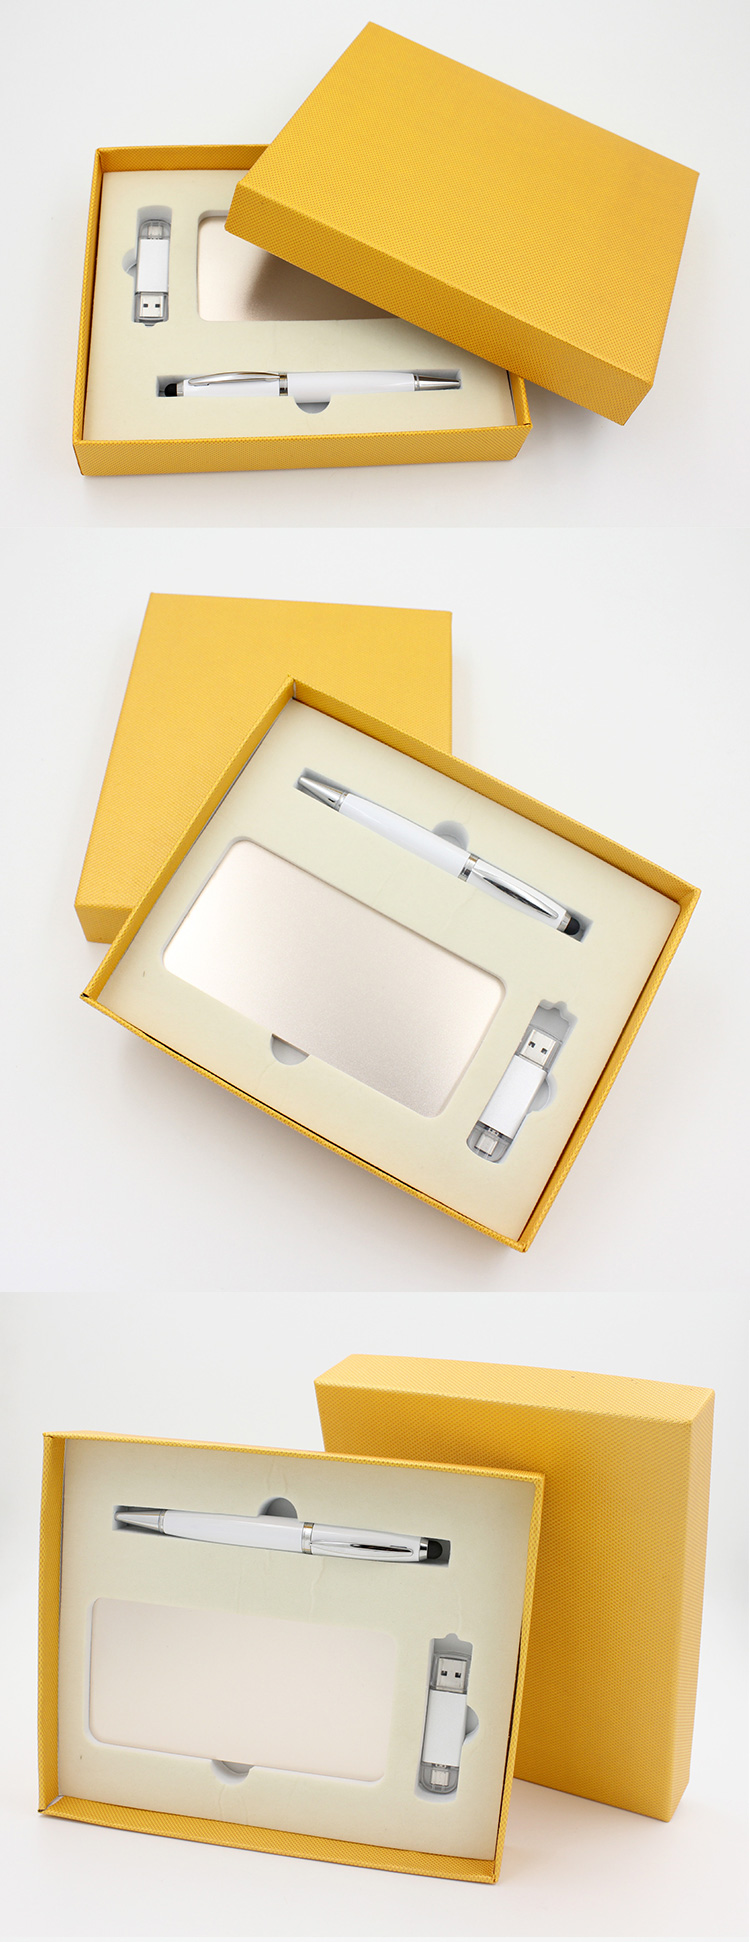 2018 hot selling Power bank Gift set 4000mah/8000mah powerbank with USB flash drive and pen